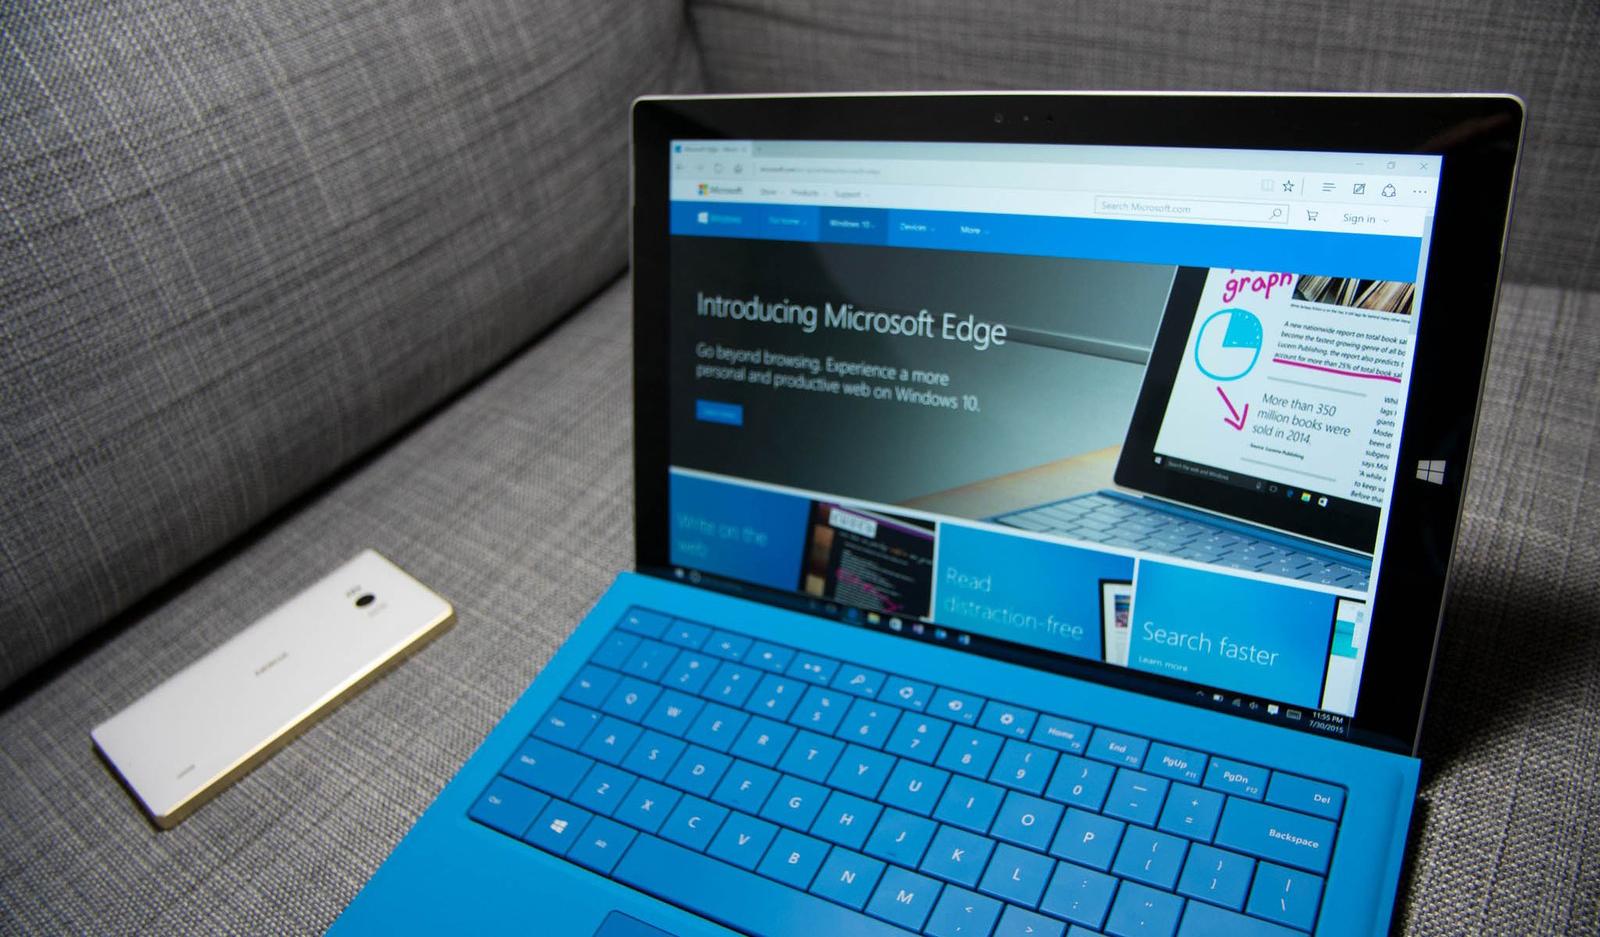 Microsoft объявил войну независимым браузерам, чем навредил всему интернету